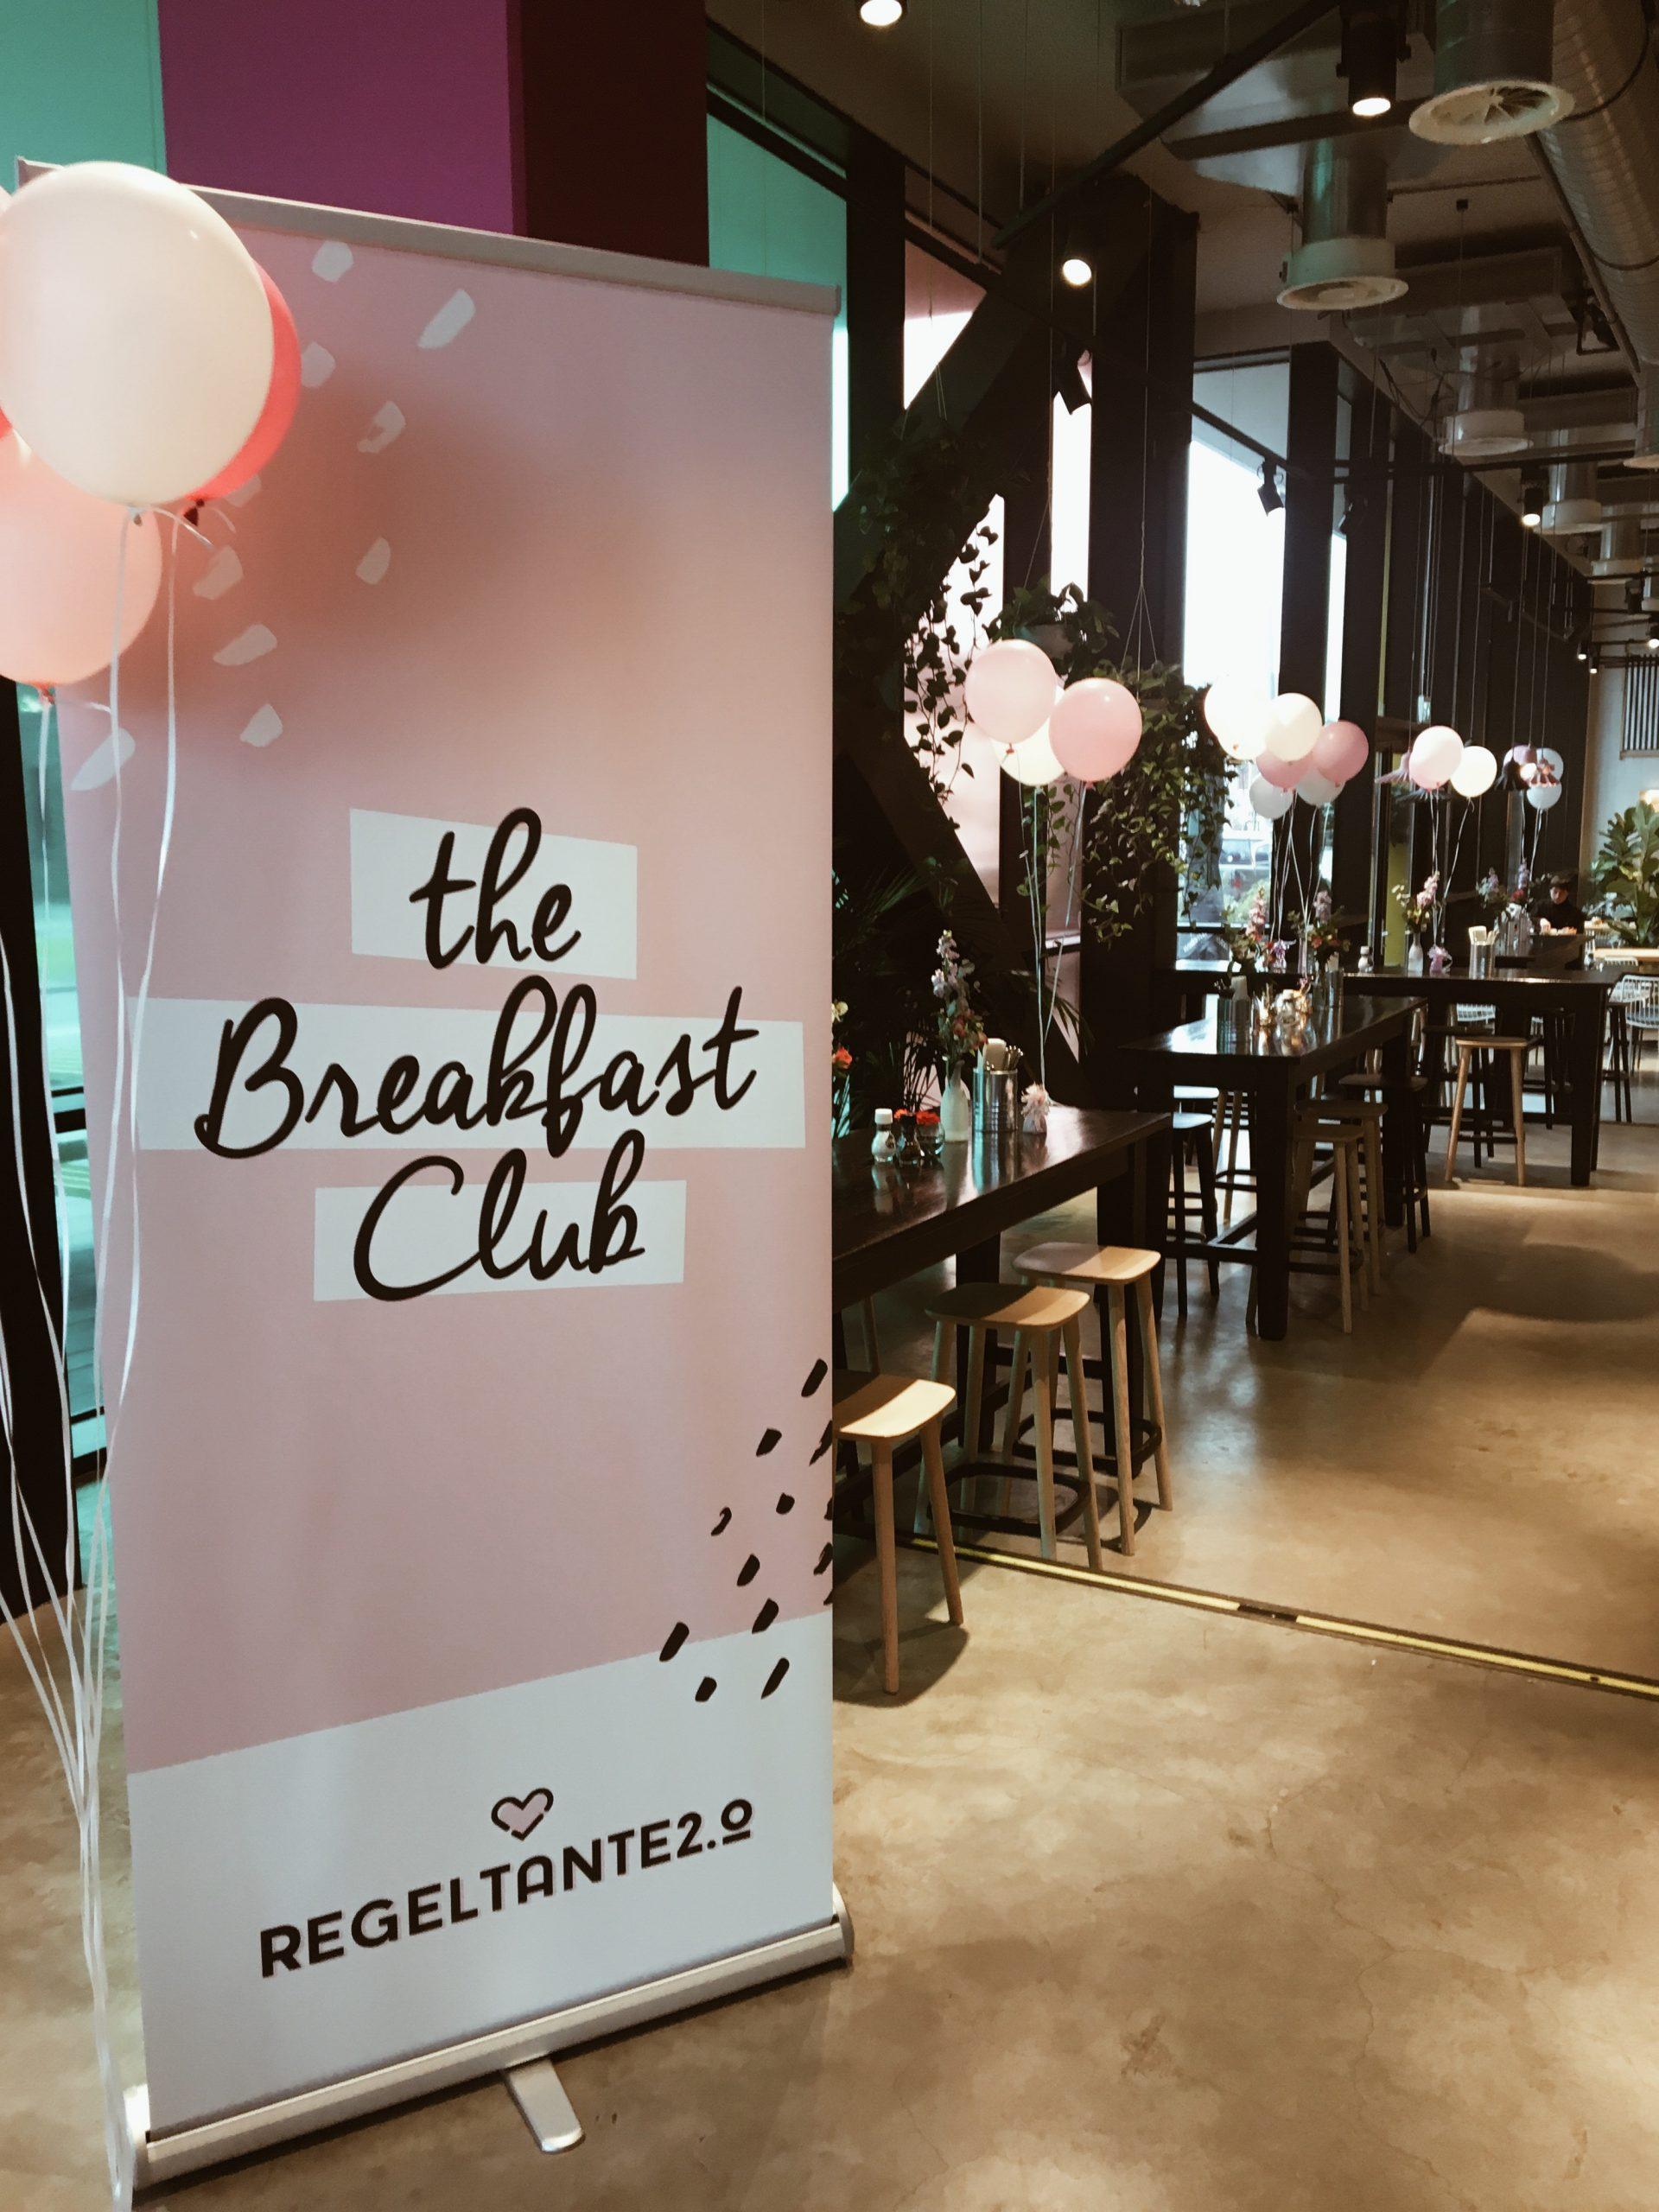 The Breakfast Club Meet Up